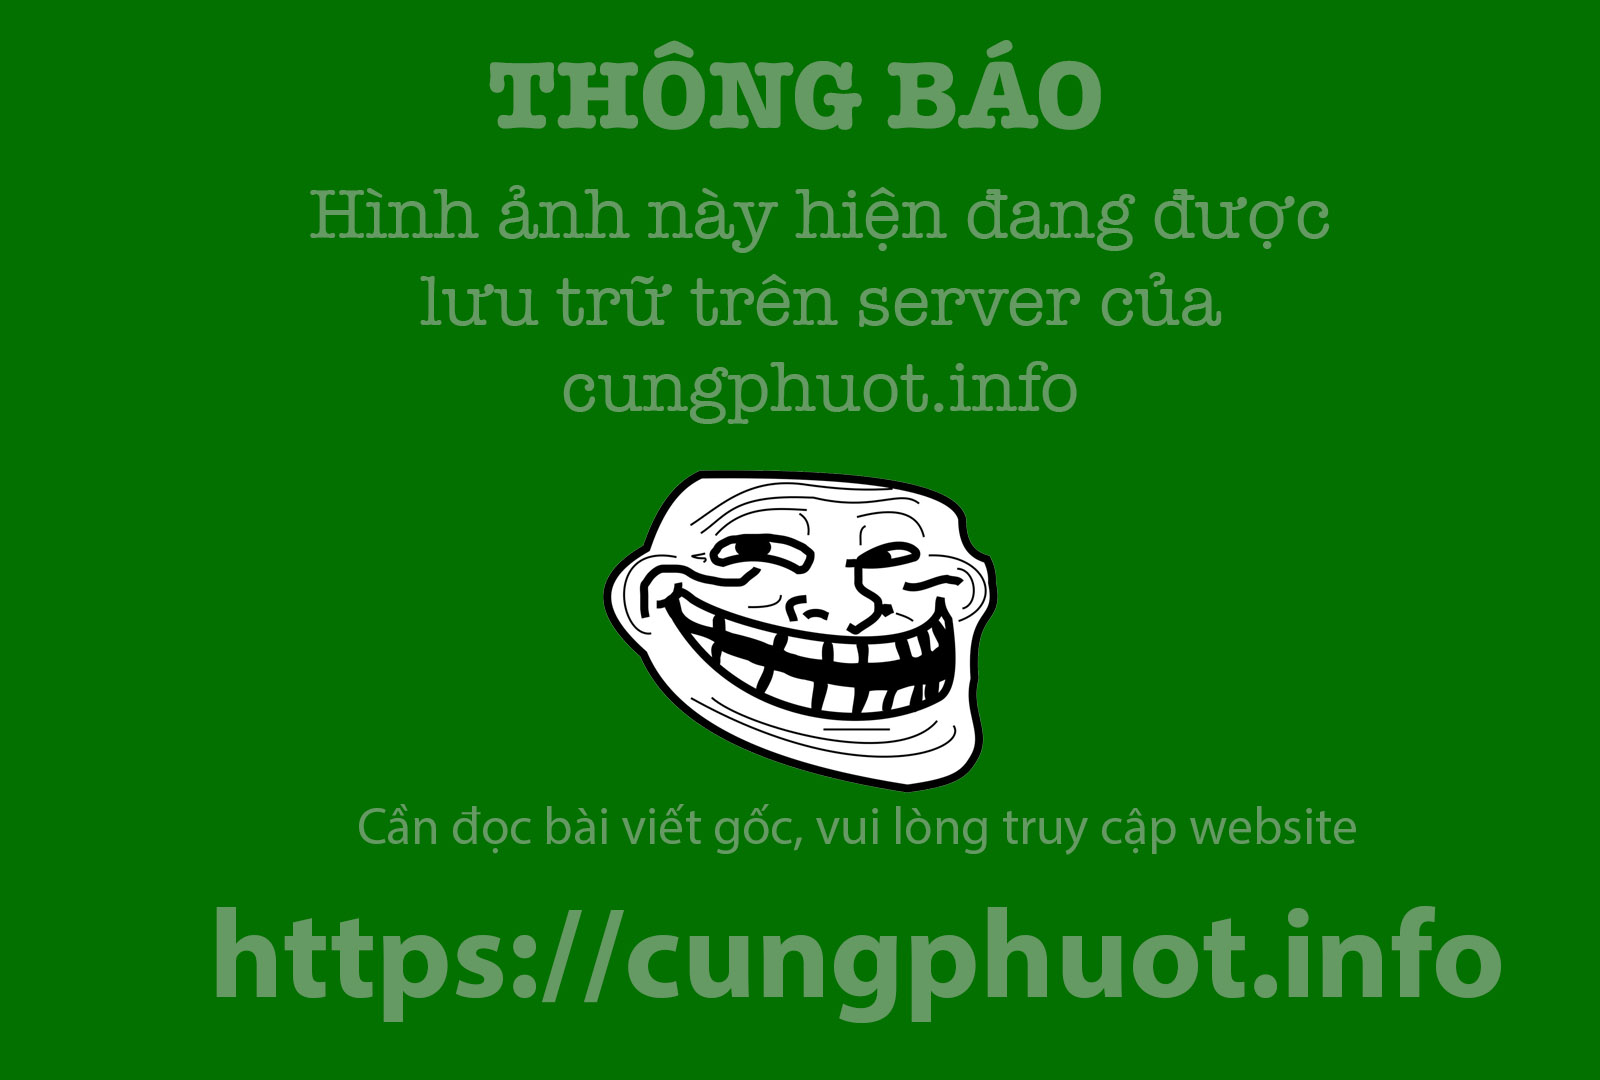 nhung-tiem-ca-phe-dep-phai-di-mot-lan-cho-biet-o-da-nang-ivivu-2